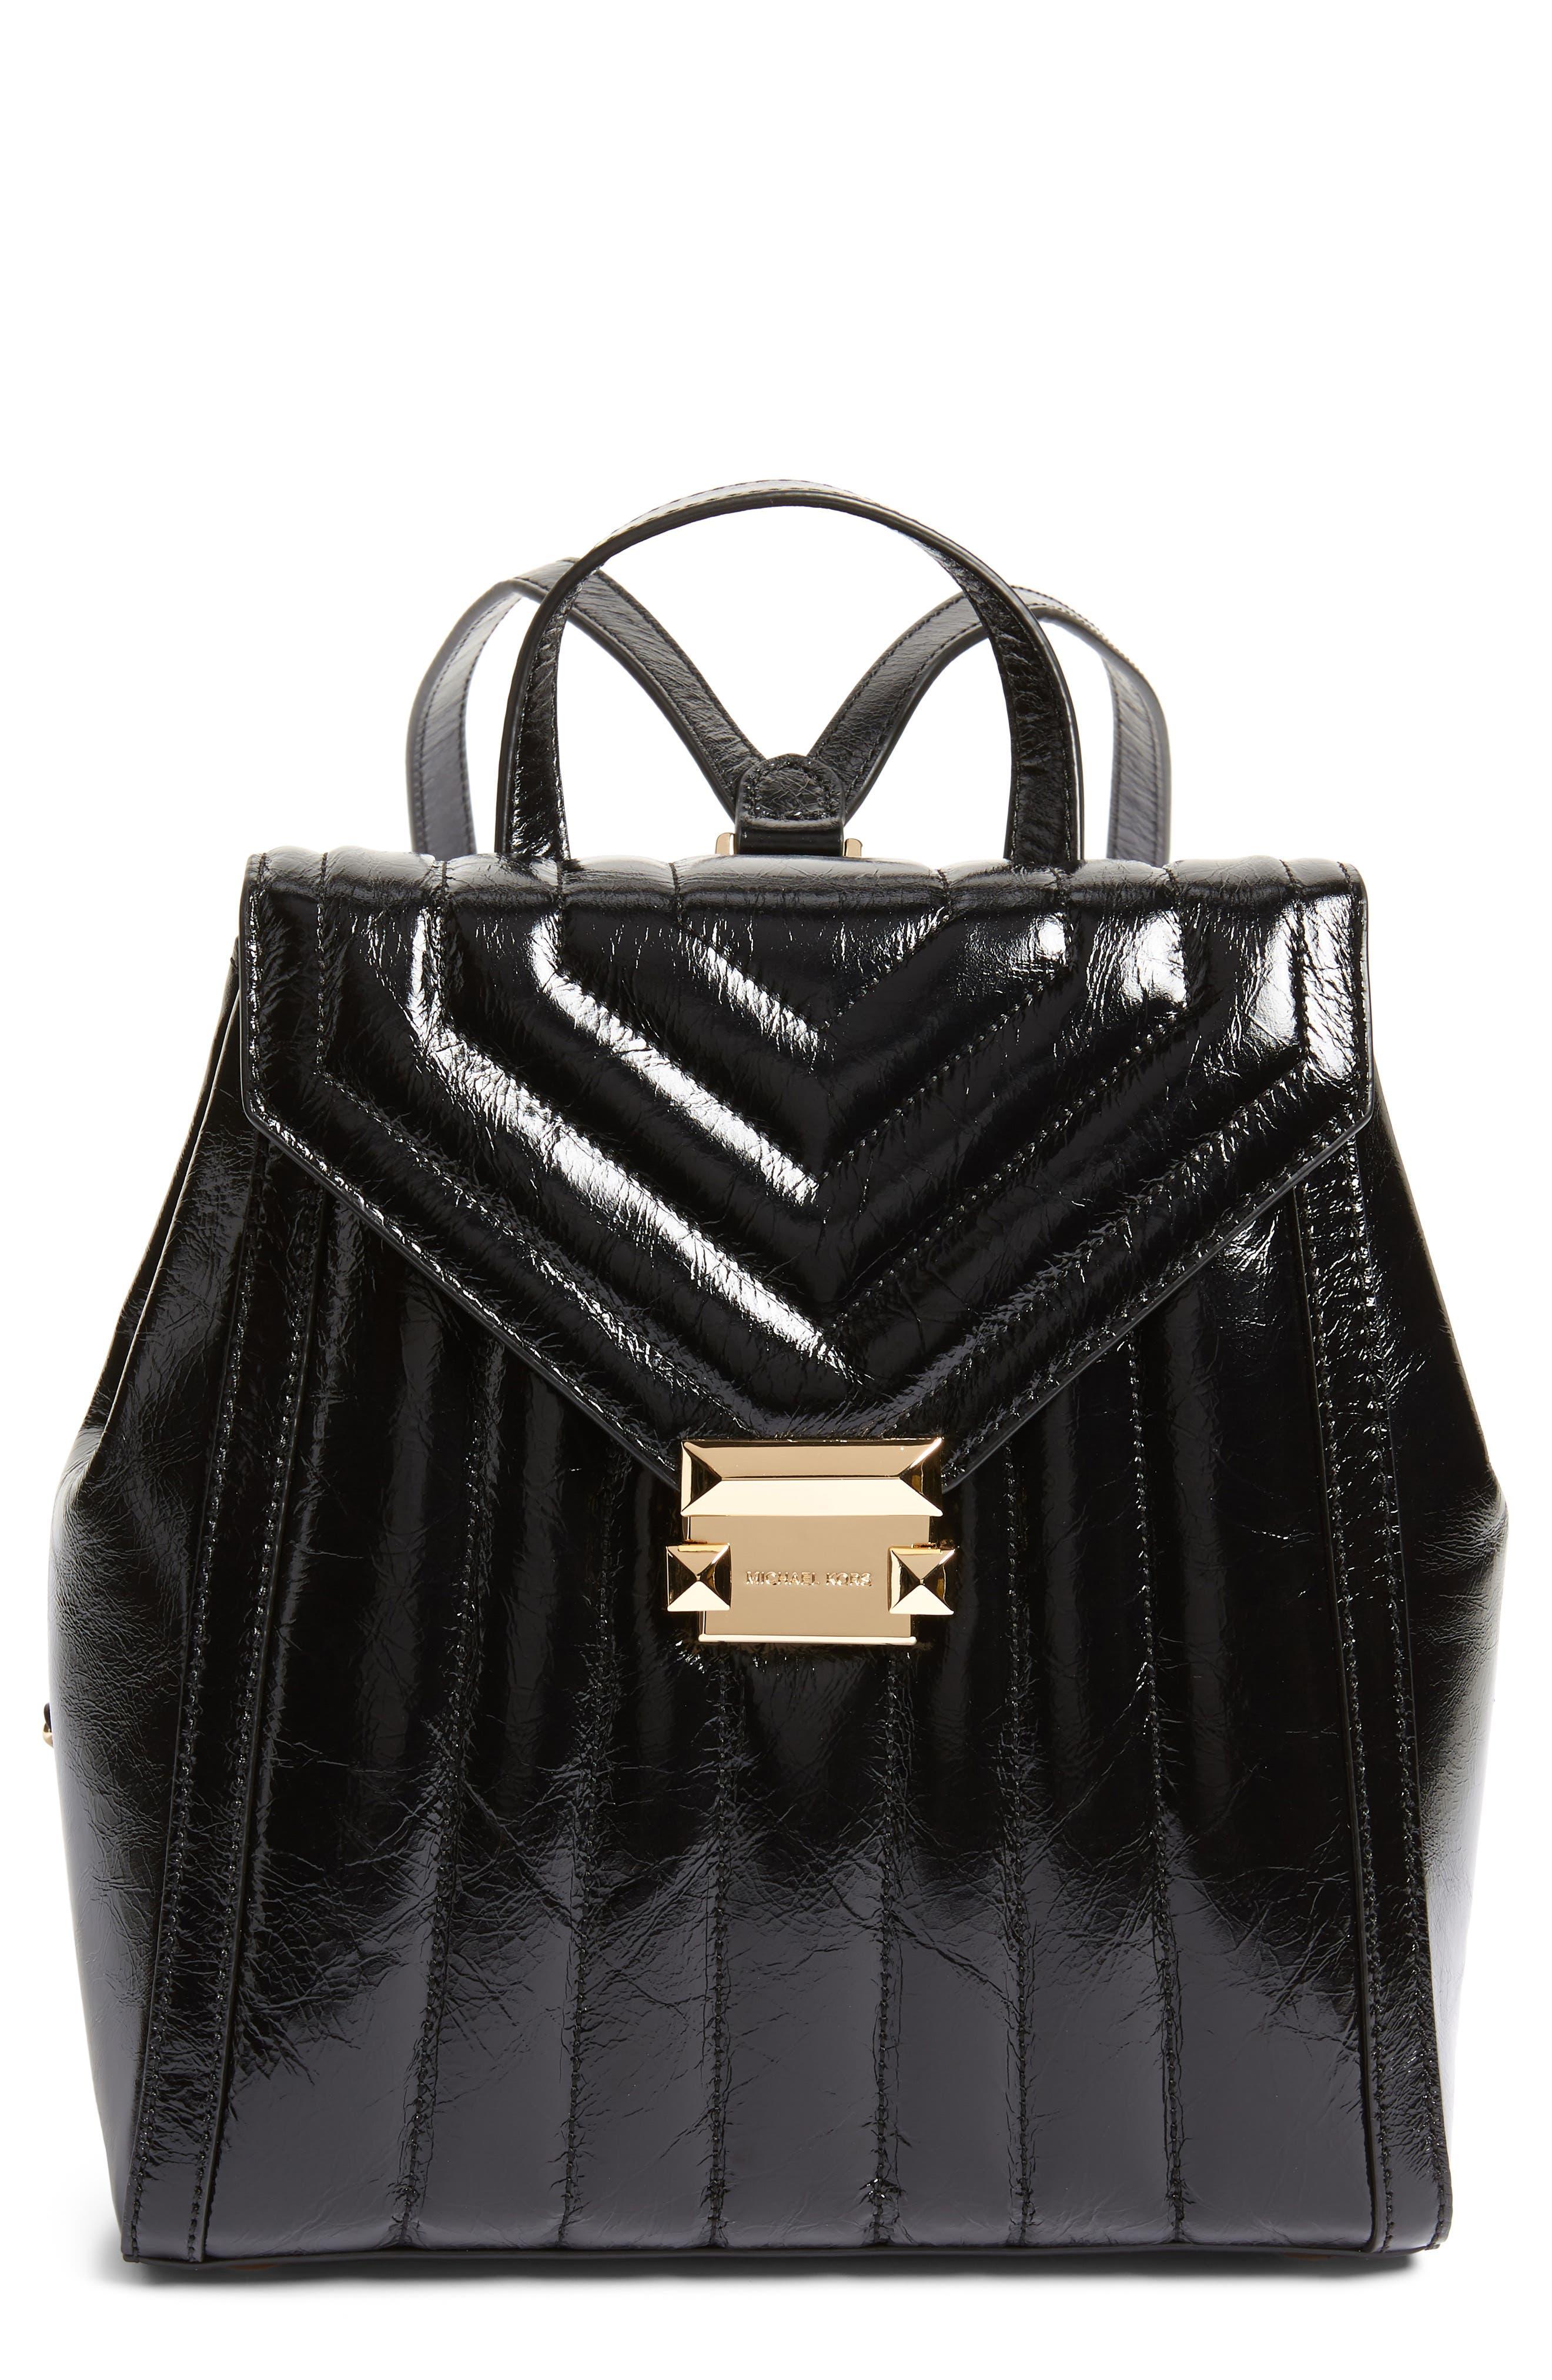 michael kors women s backpacks clothing shoes accessories rh shop nordstrom com